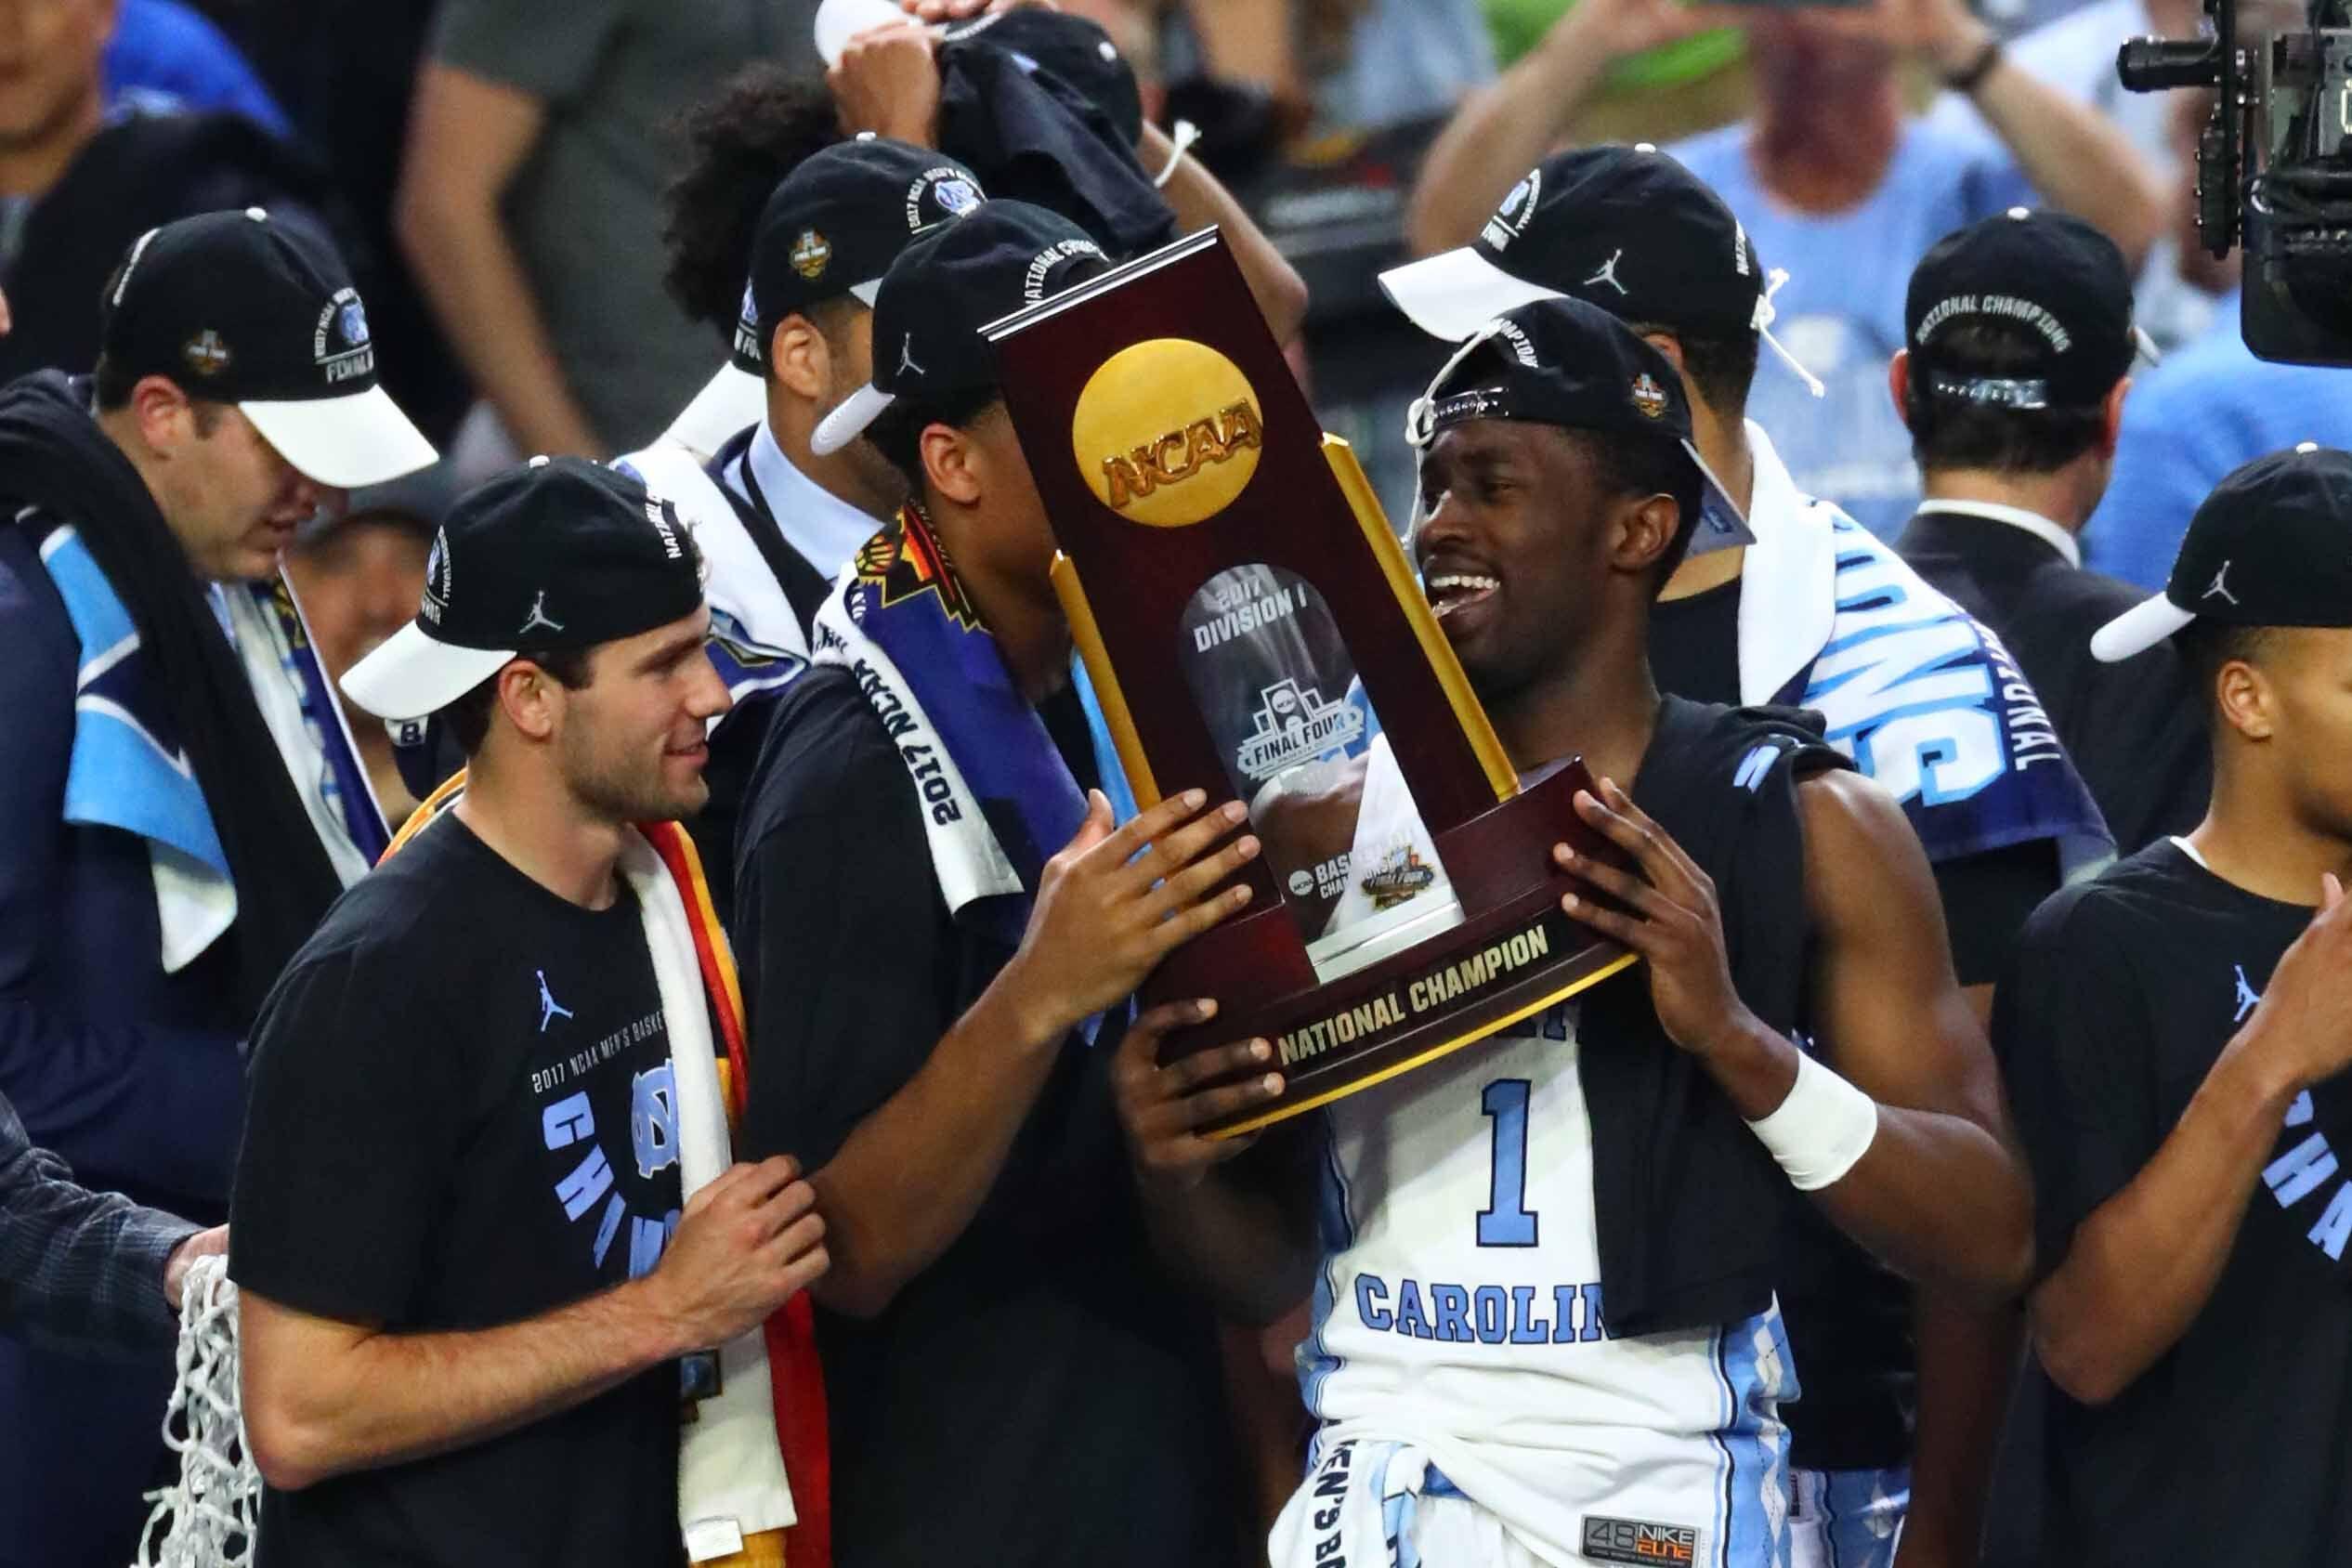 Highlights from the national championship gonzaga vs north carolina - Unc Basketball Fans Rush Franklin Street After National Championship Game